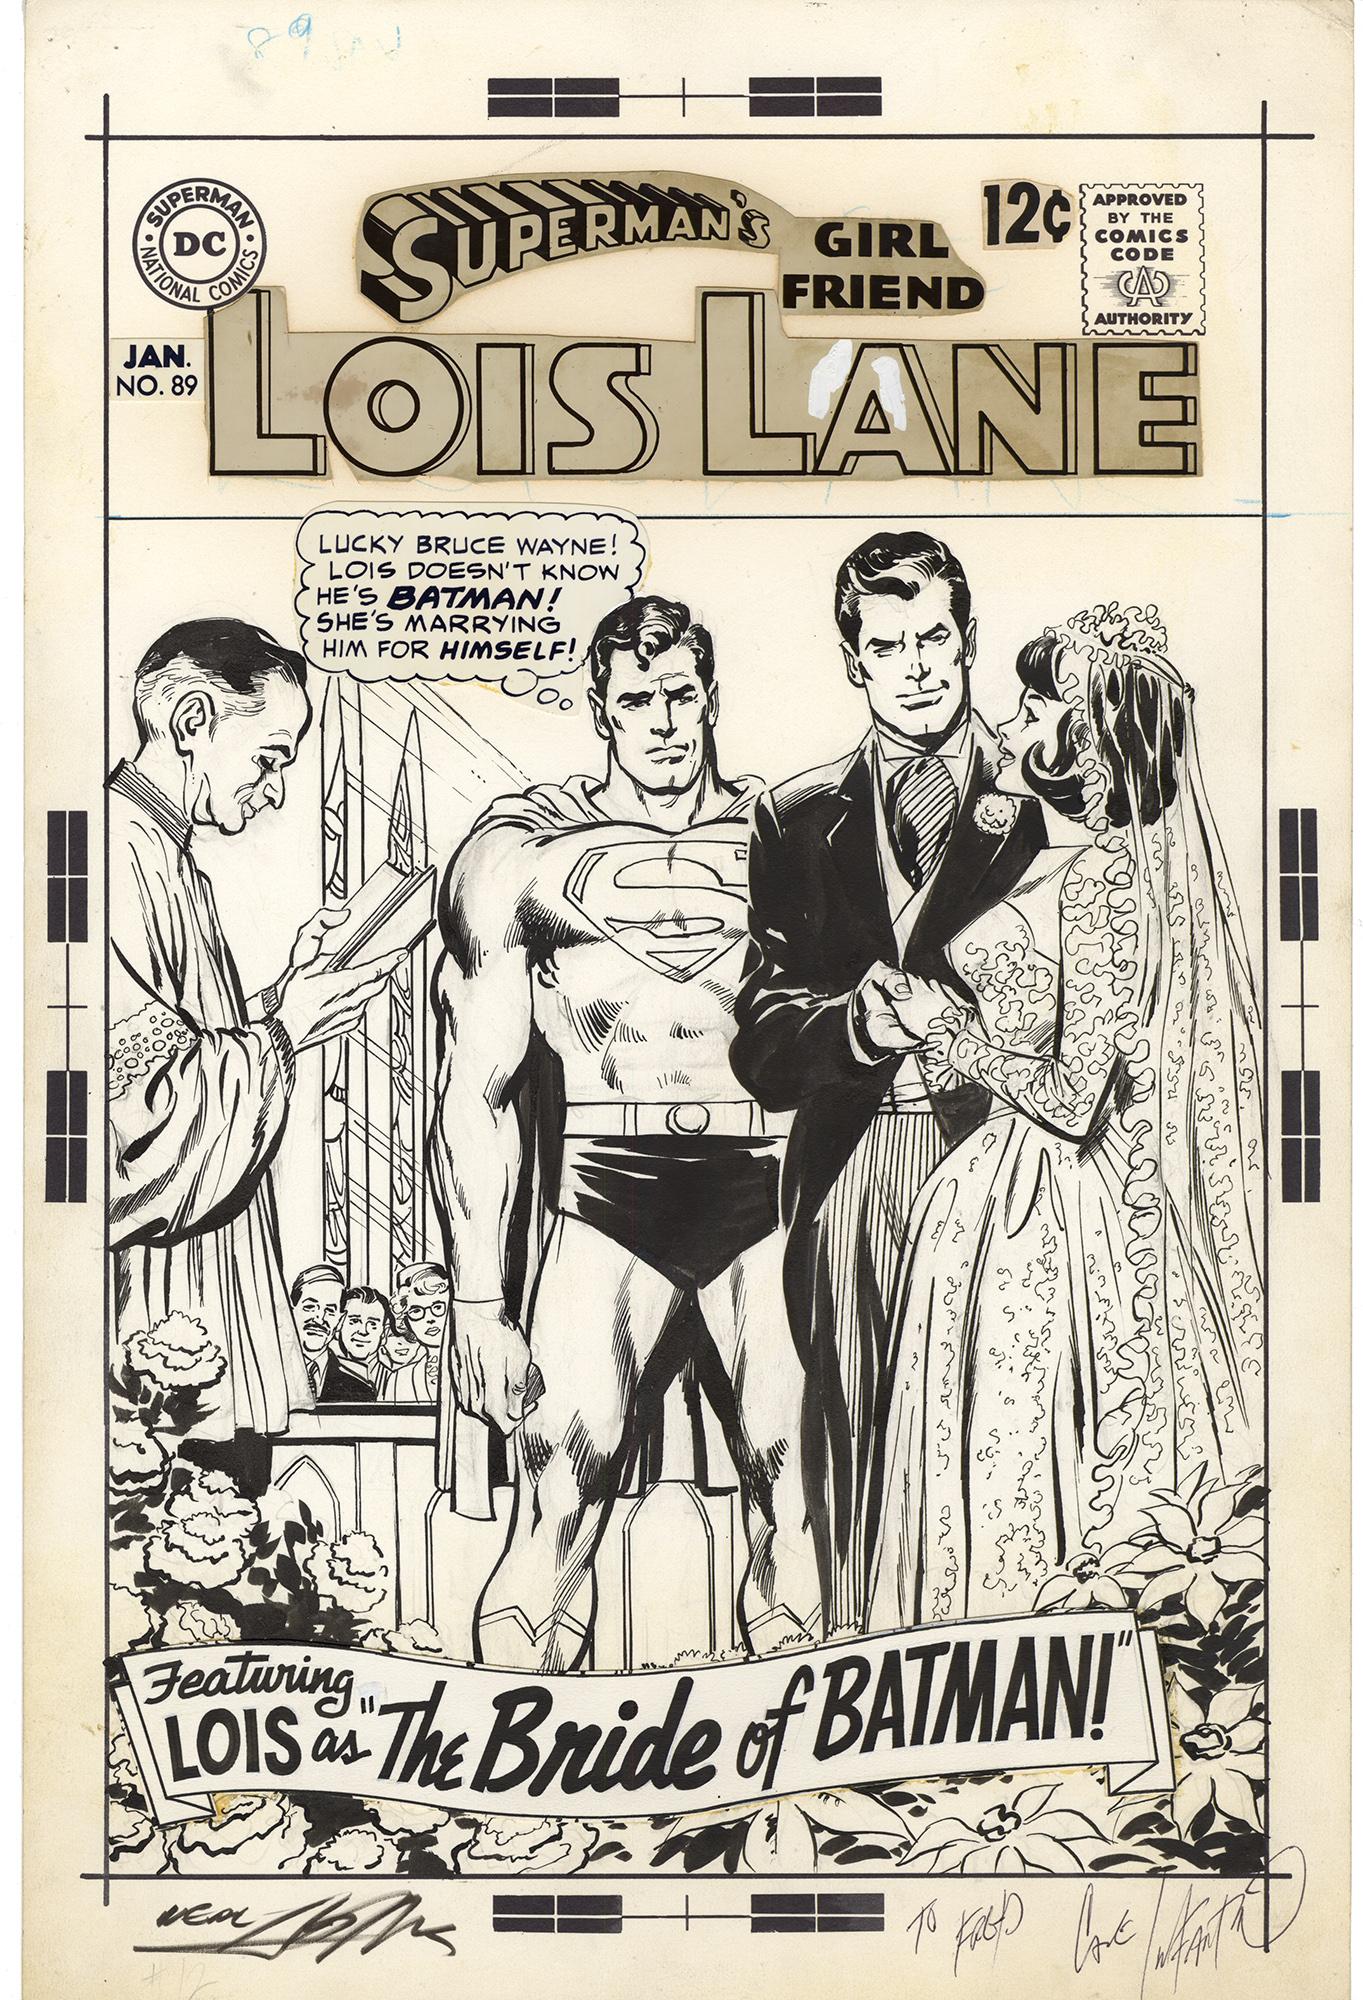 Superman's Girl Friend Lois Lane #89 Cover (Neal Adams)